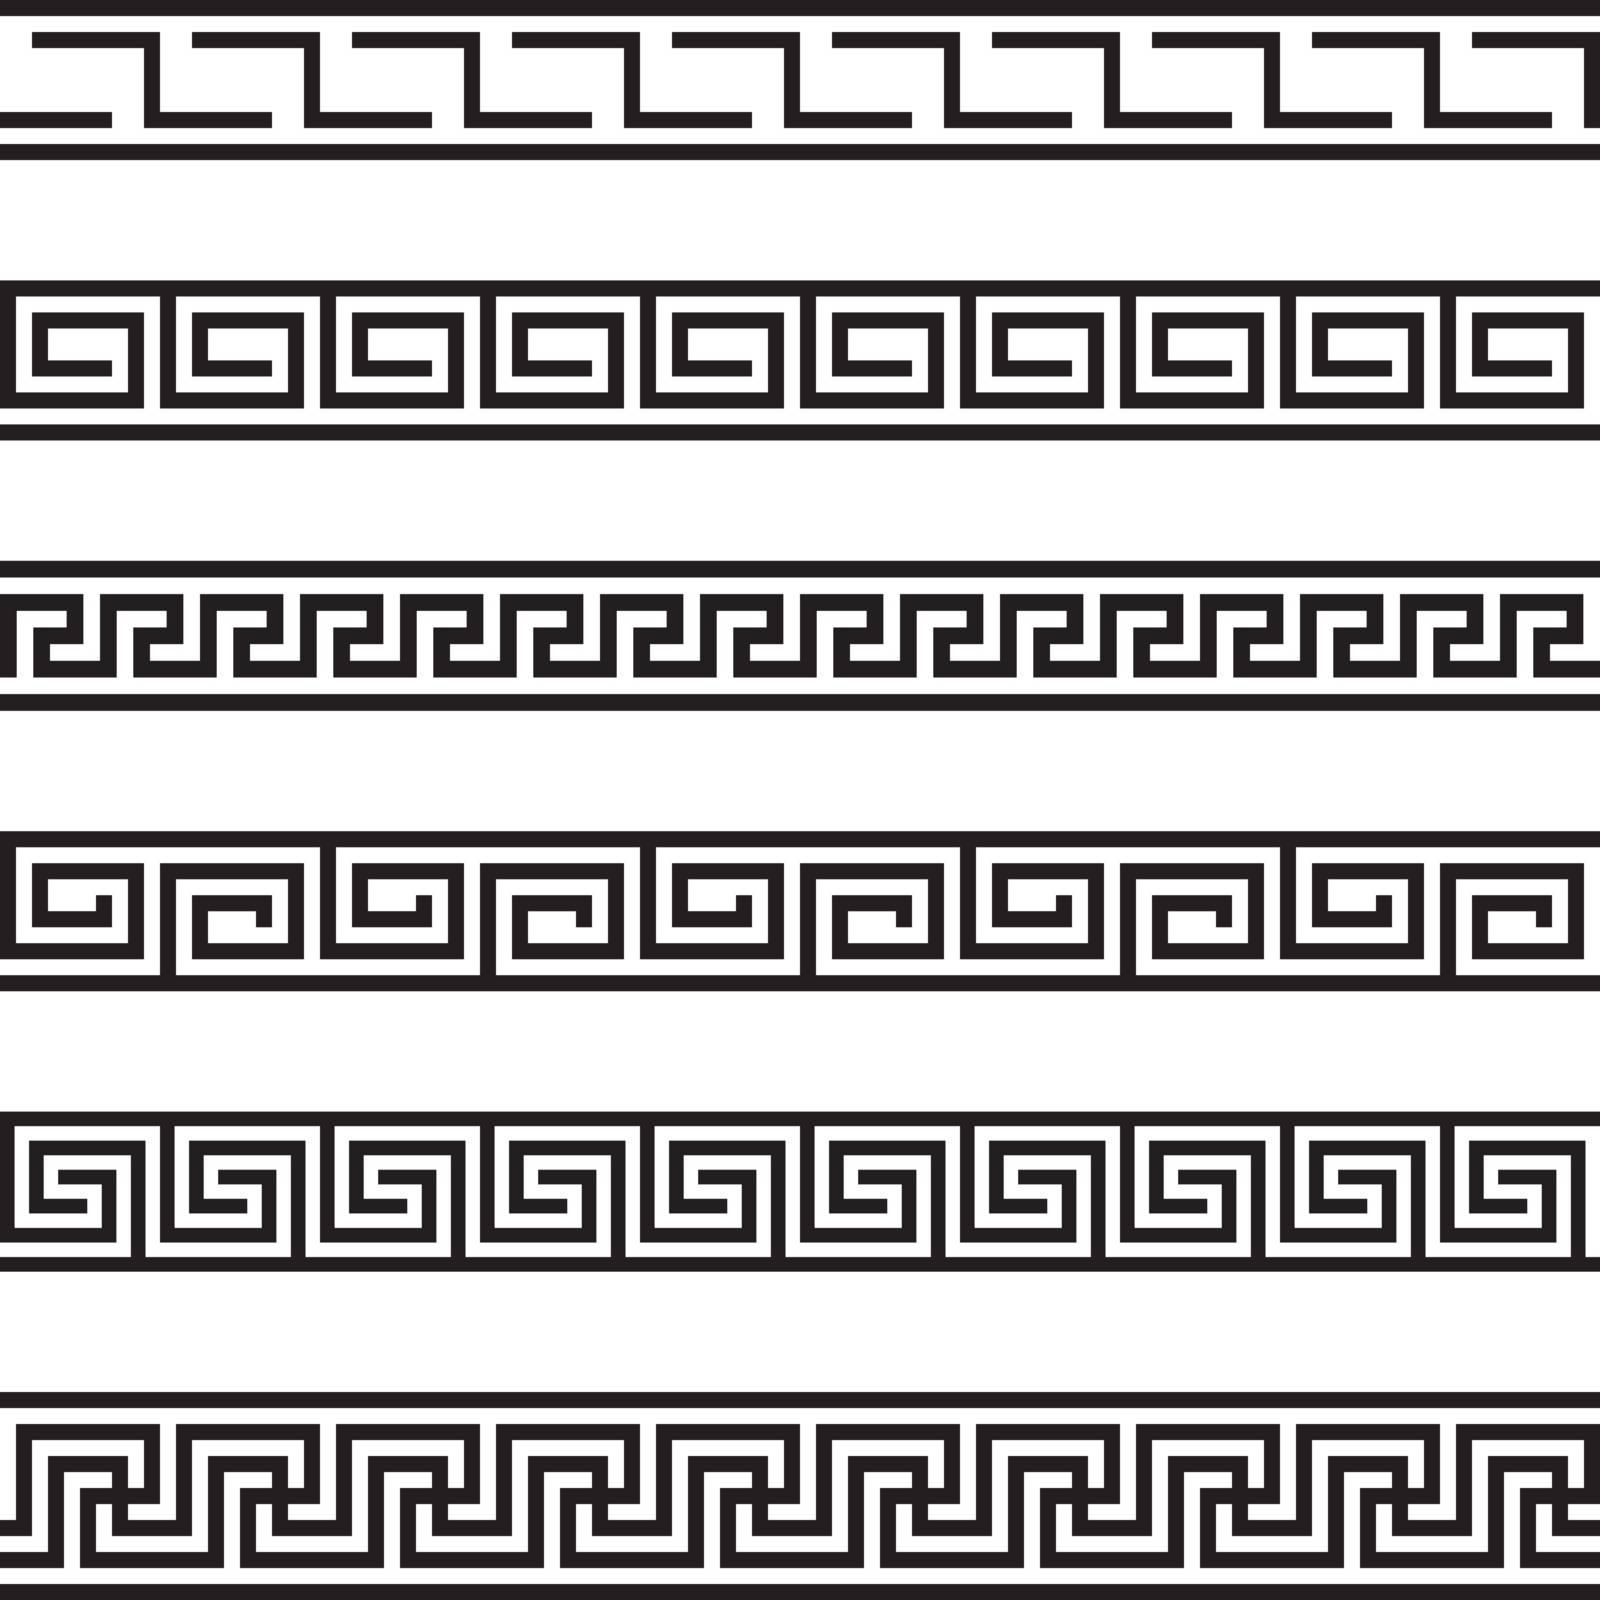 Set of six illustrated decorative borders made of geometrical black elements